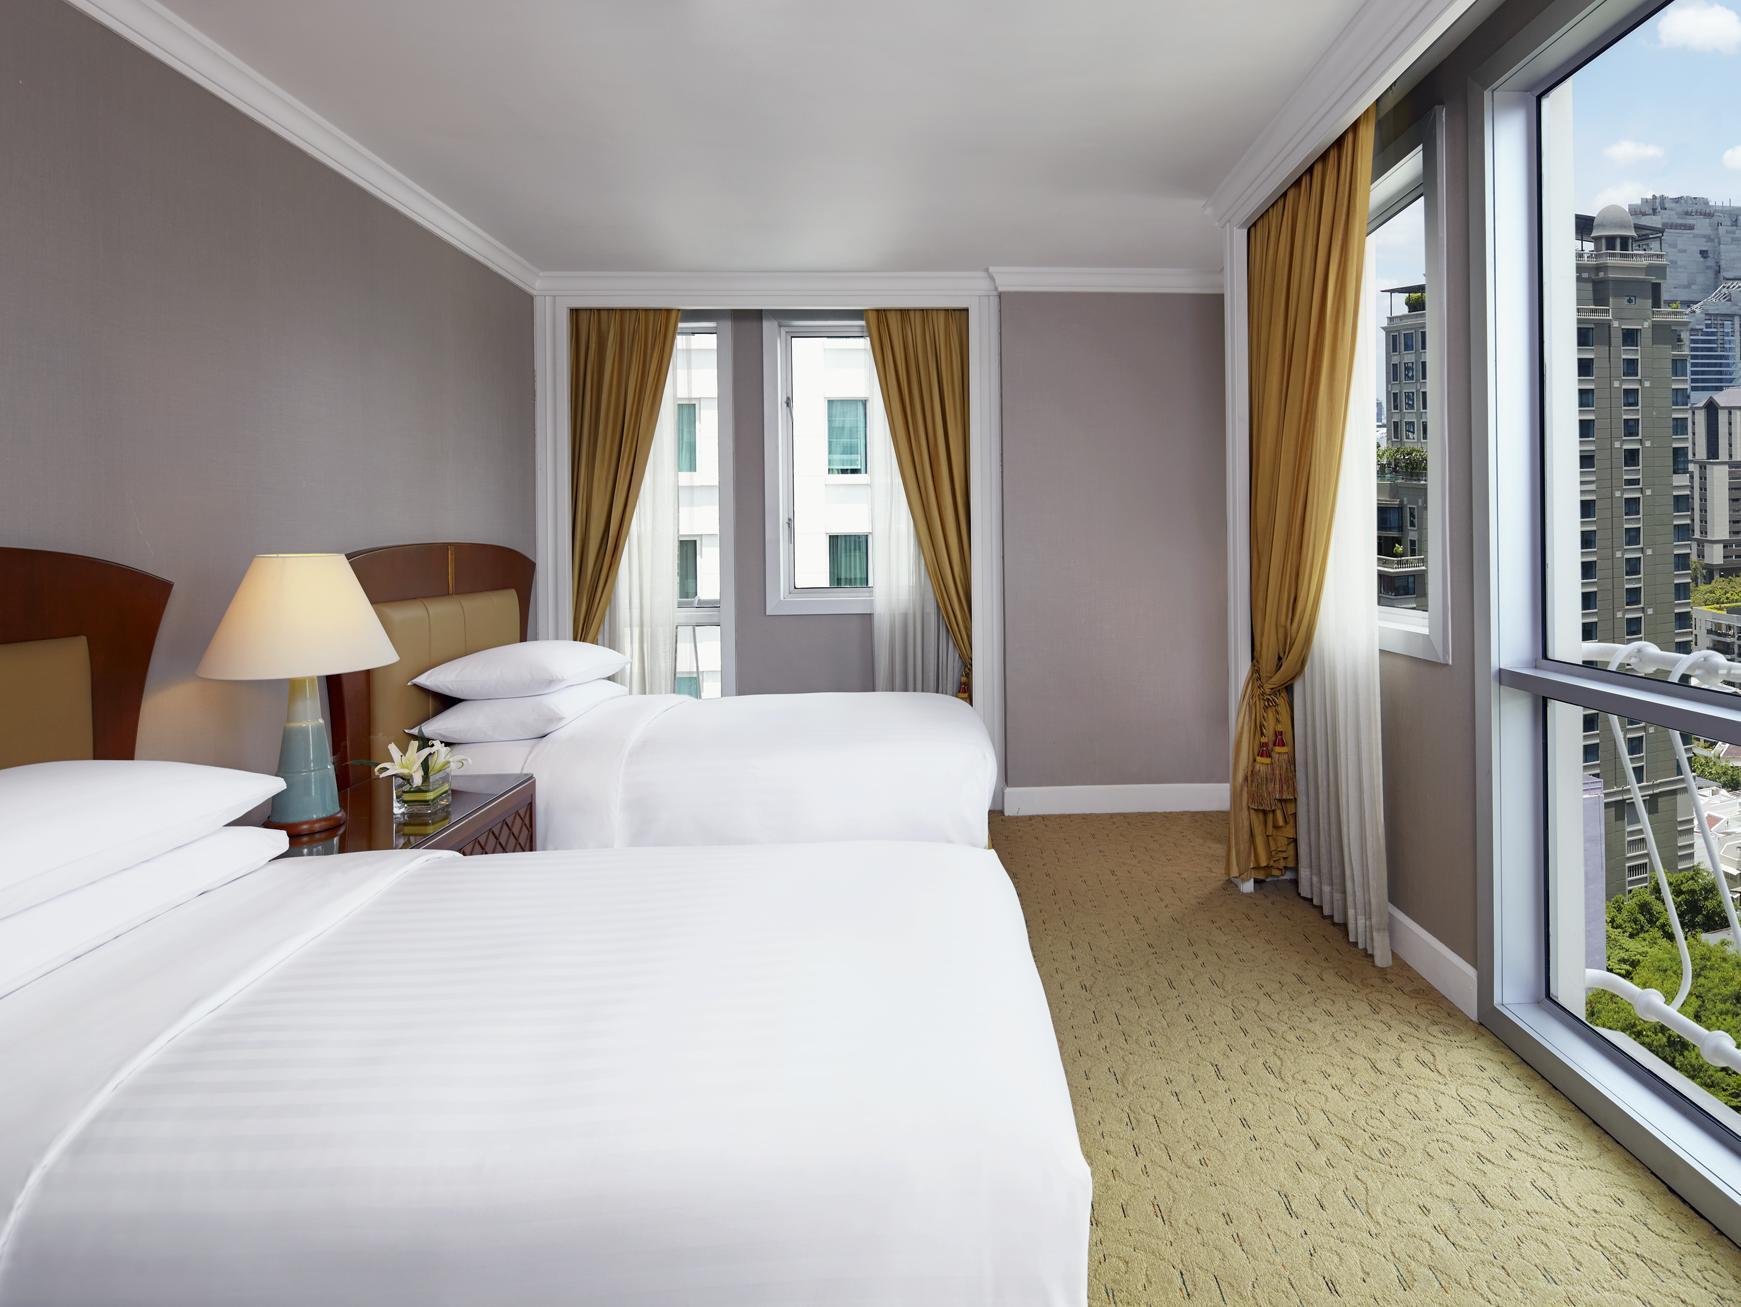 Mayfair, Bangkok - Marriott Executive Apartments เมย์แฟร์ กรุงเทพฯ - แมริออท เอ็กเซกคิวทีฟ อพาร์ตเมนต์